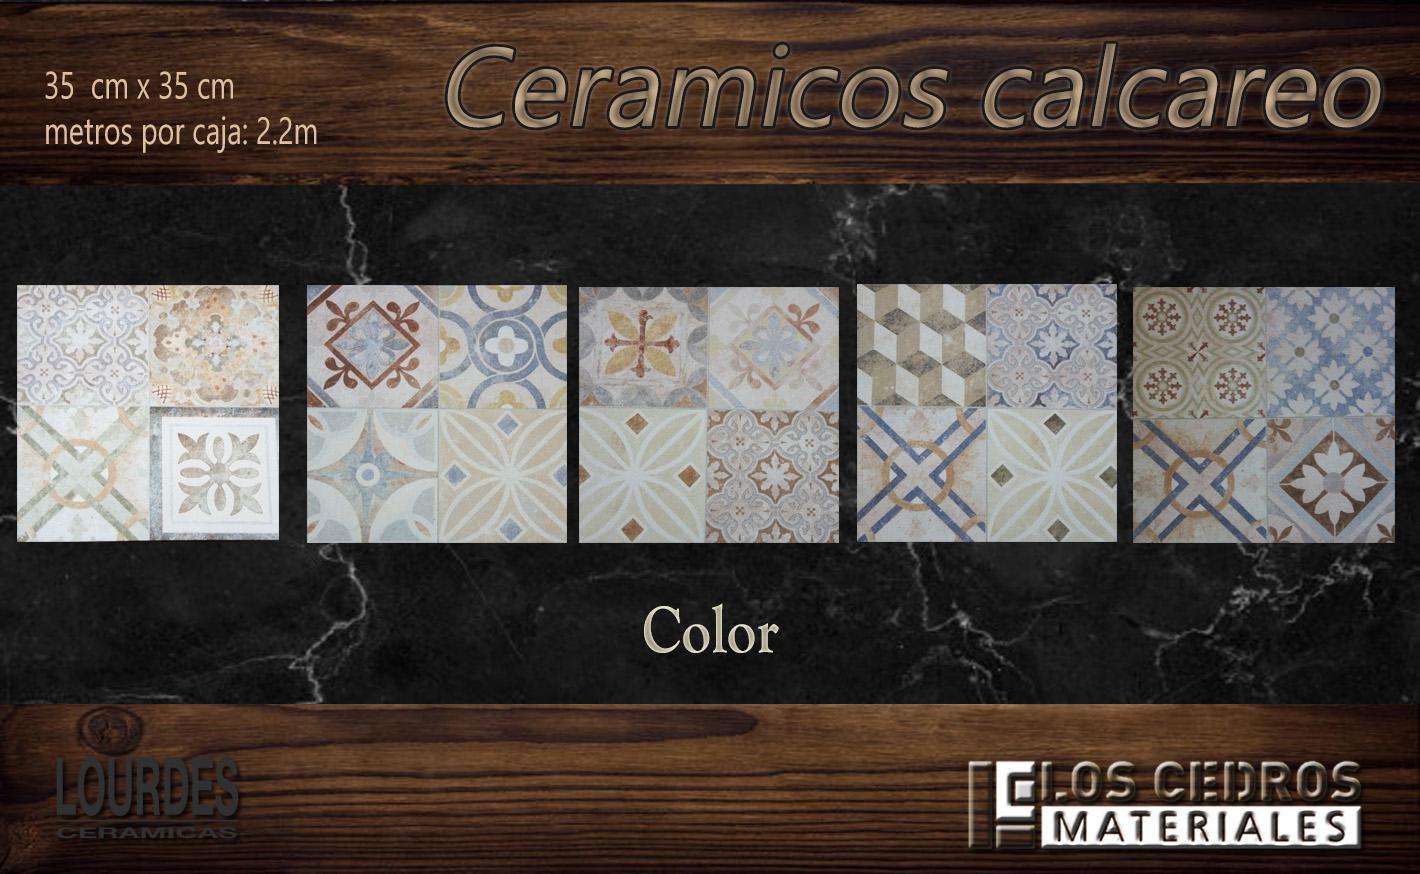 ceramicos calcareo